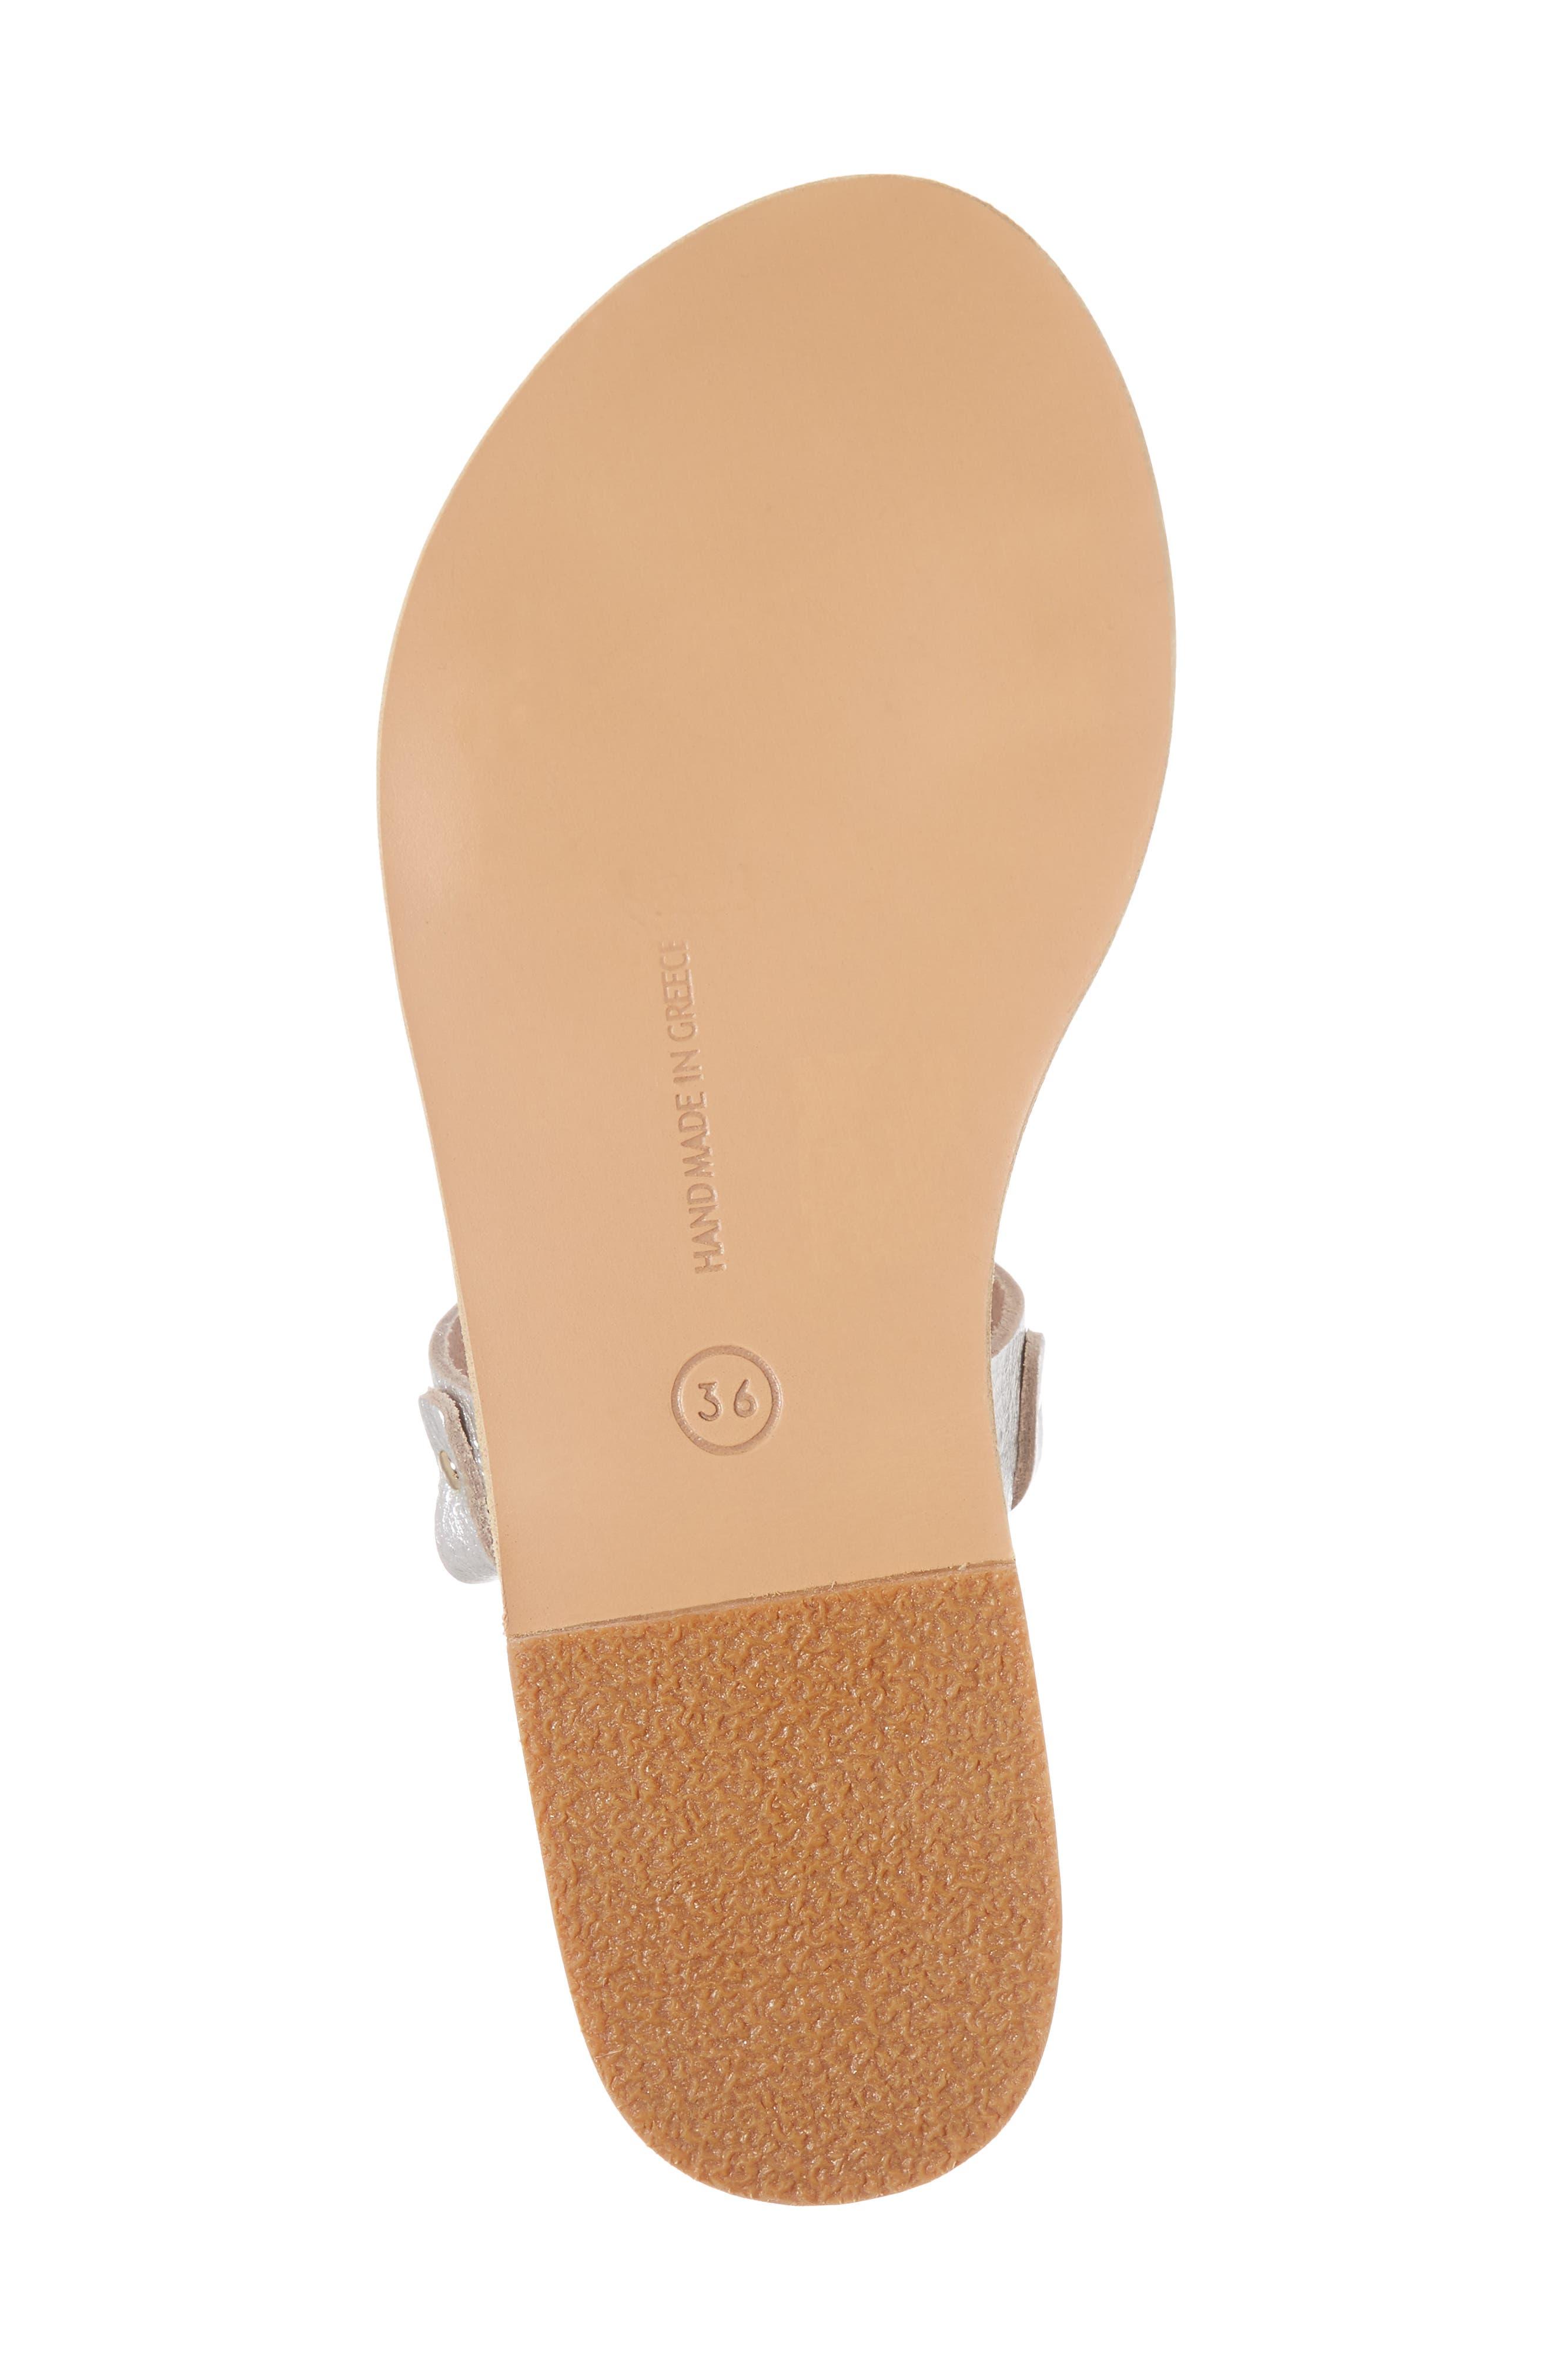 Clio Slingback Sandal,                             Alternate thumbnail 6, color,                             041